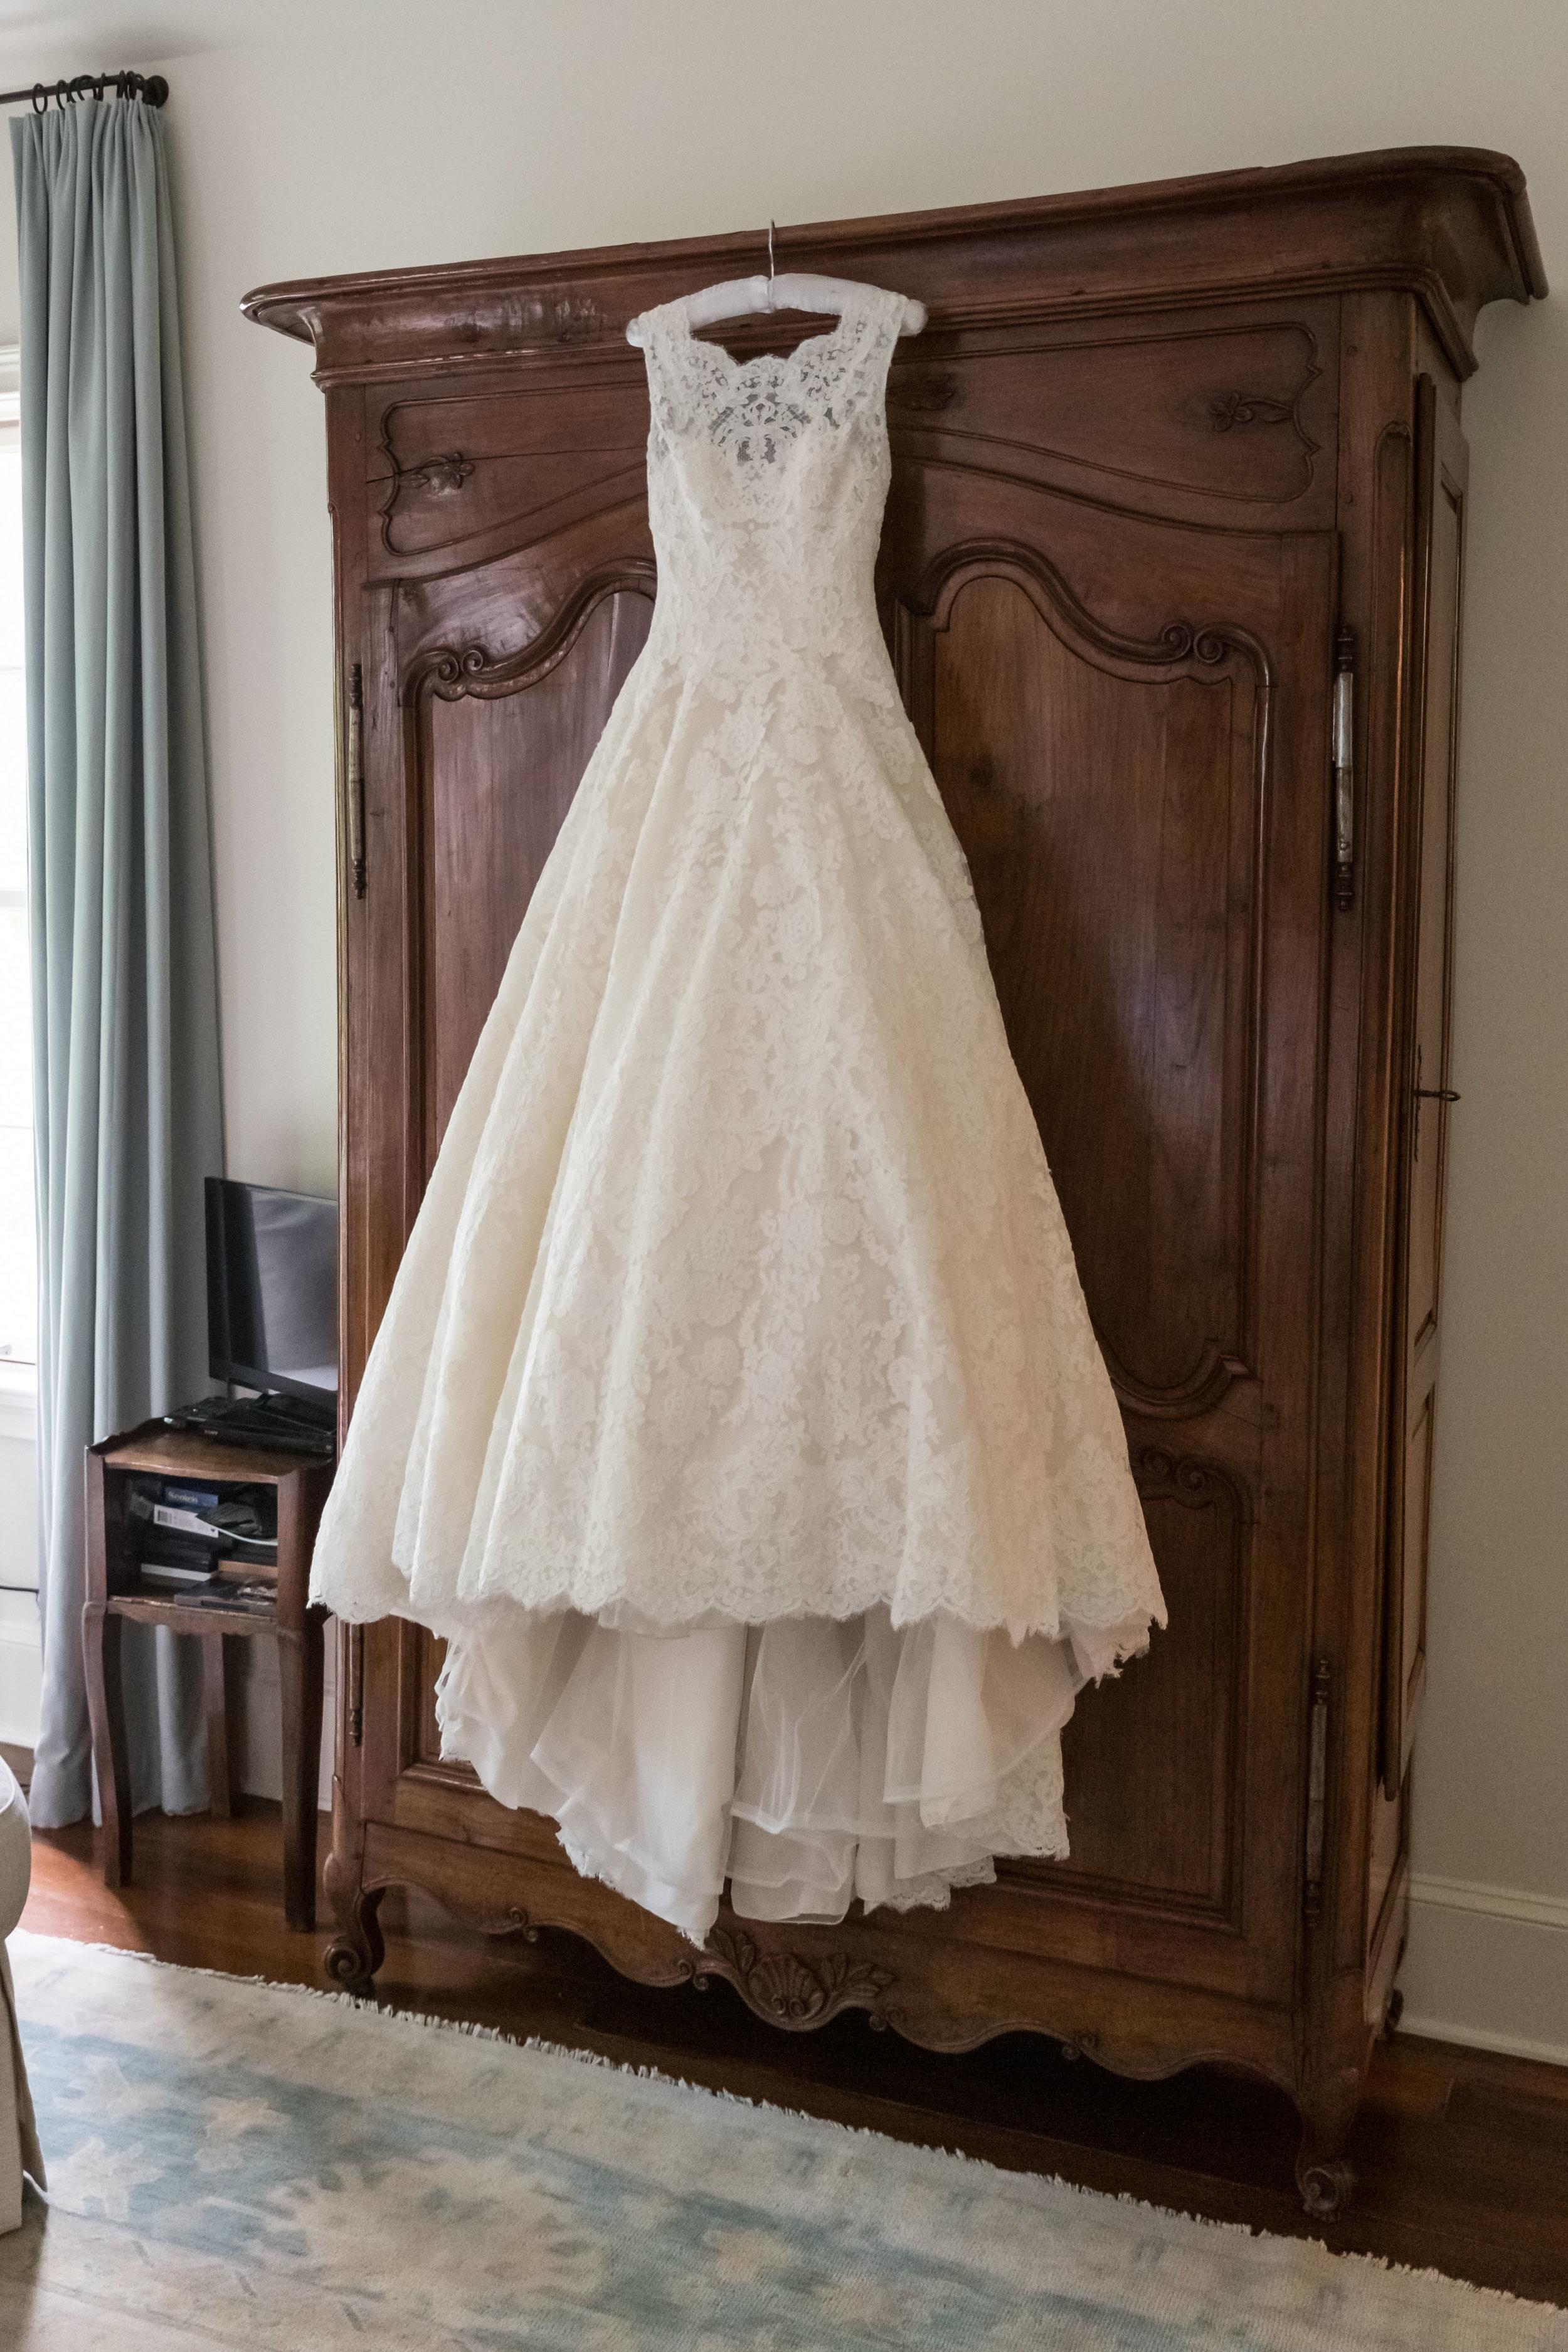 Southern Fete, Southern Wedding, Wedding Dress, Jay Faugot Photography